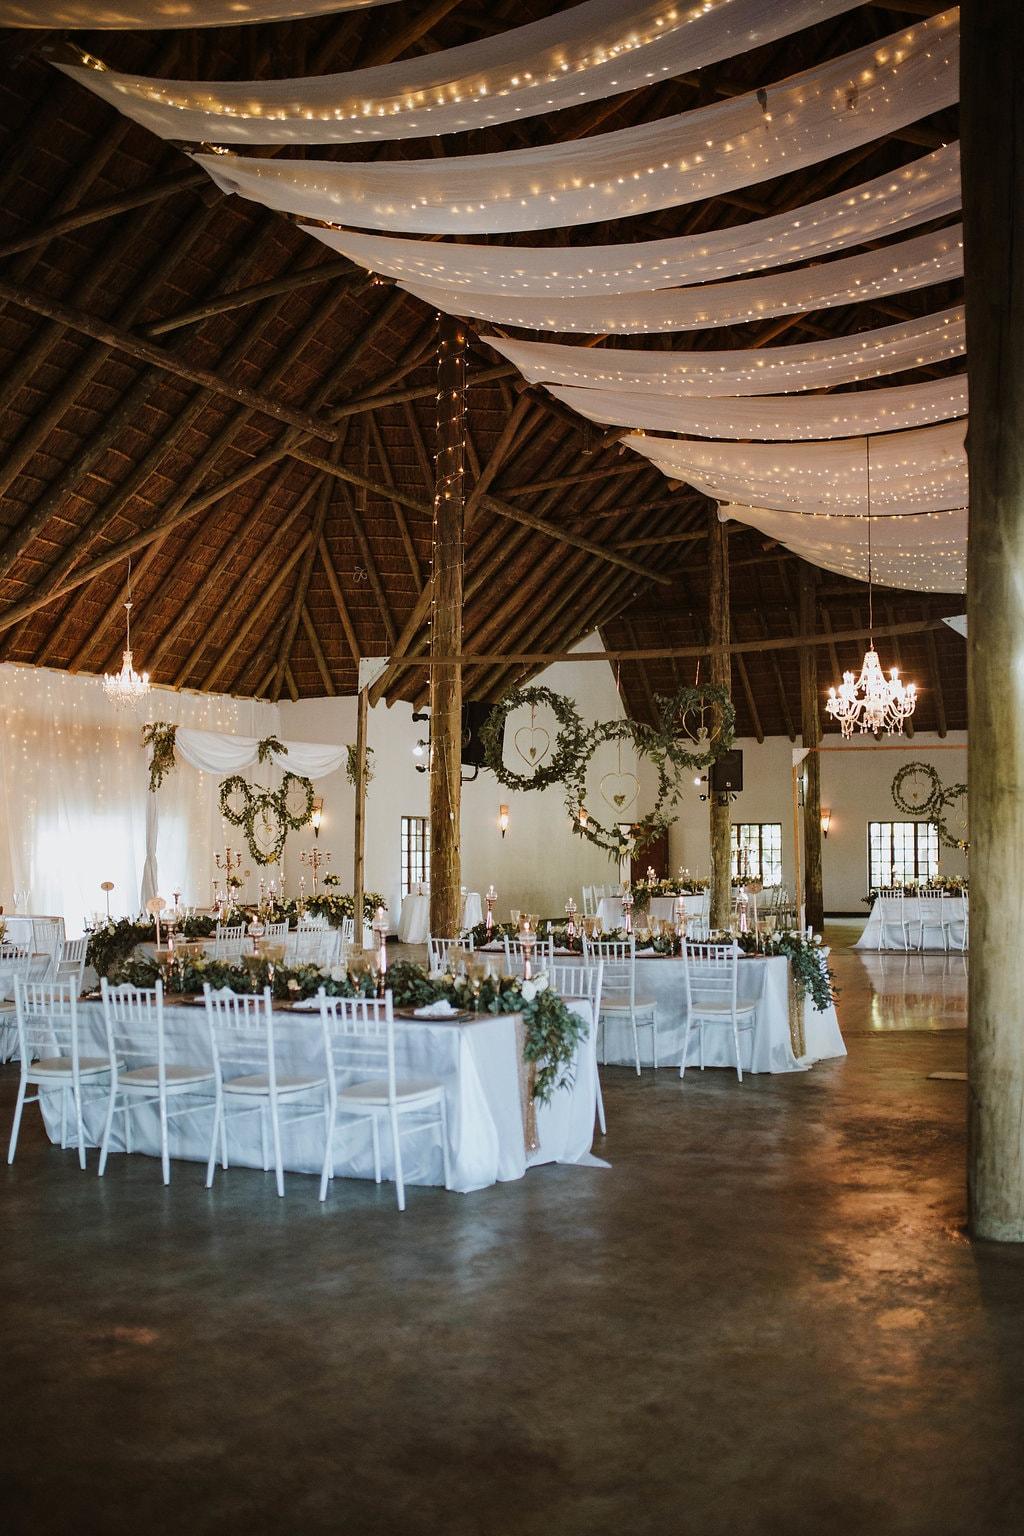 Sentimental Rustic Wedding Reception Decor | Image: Jessica J Photography